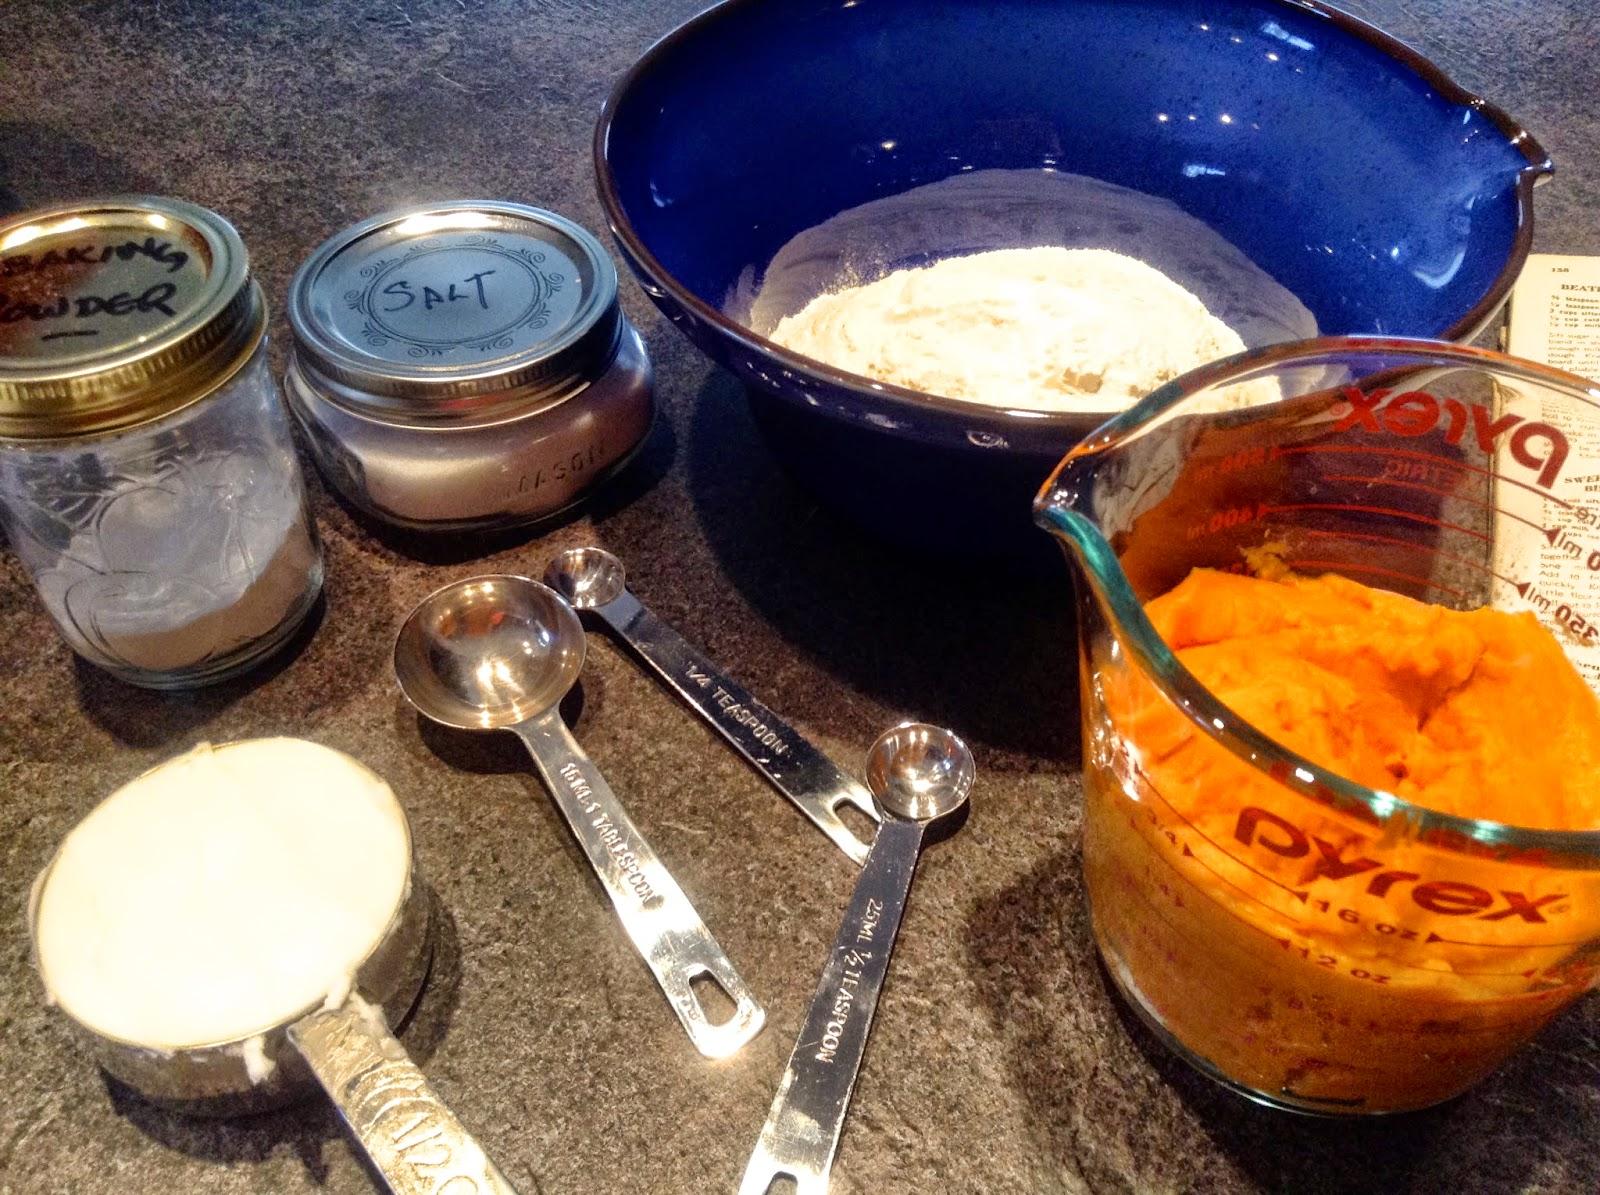 Sweetpotato biscuits ingredients